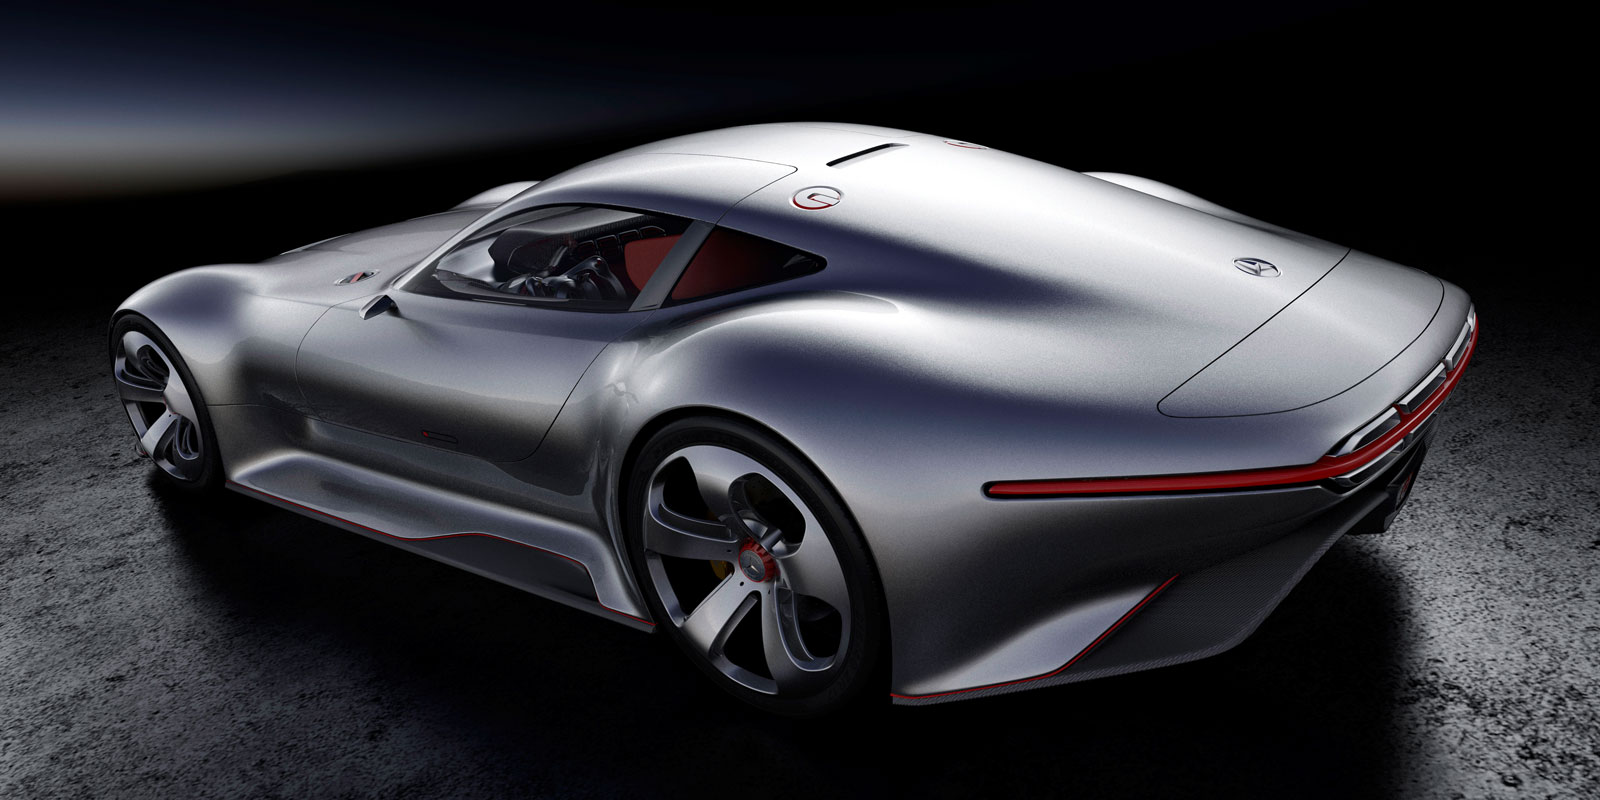 Mercedes benz amg gran turismo concept 3d rendering car for Mercedes benz amg vision gran turismo